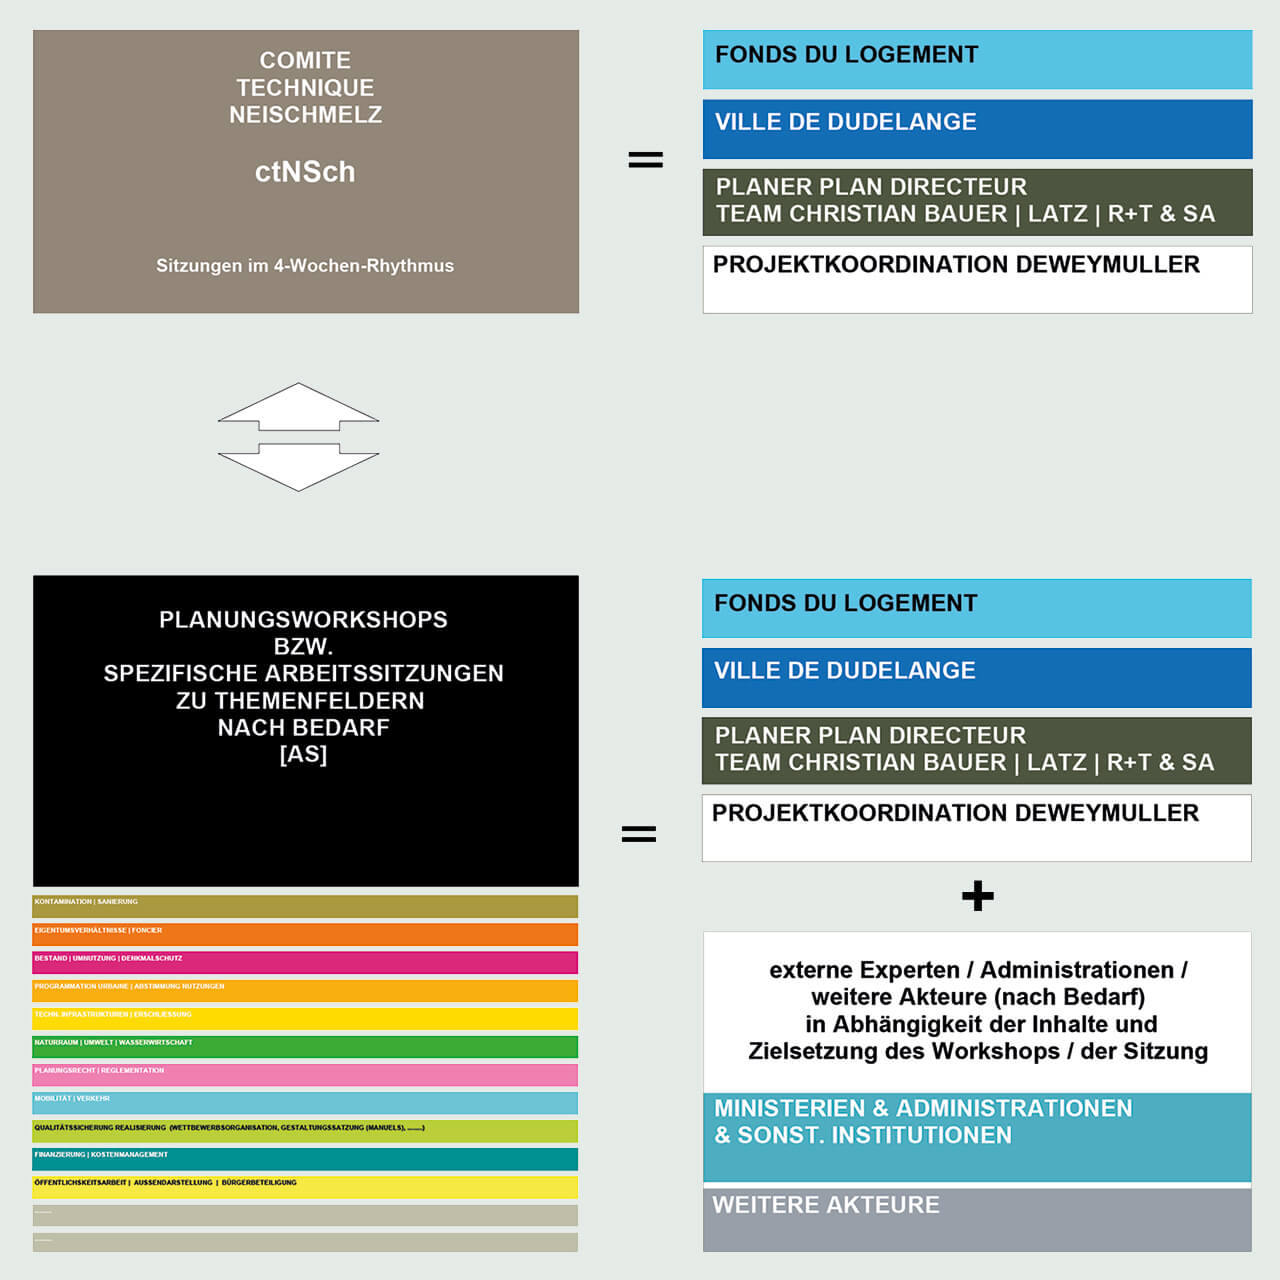 Coordination Neischmelz, Schema Akteure, Begleitsstrukturen